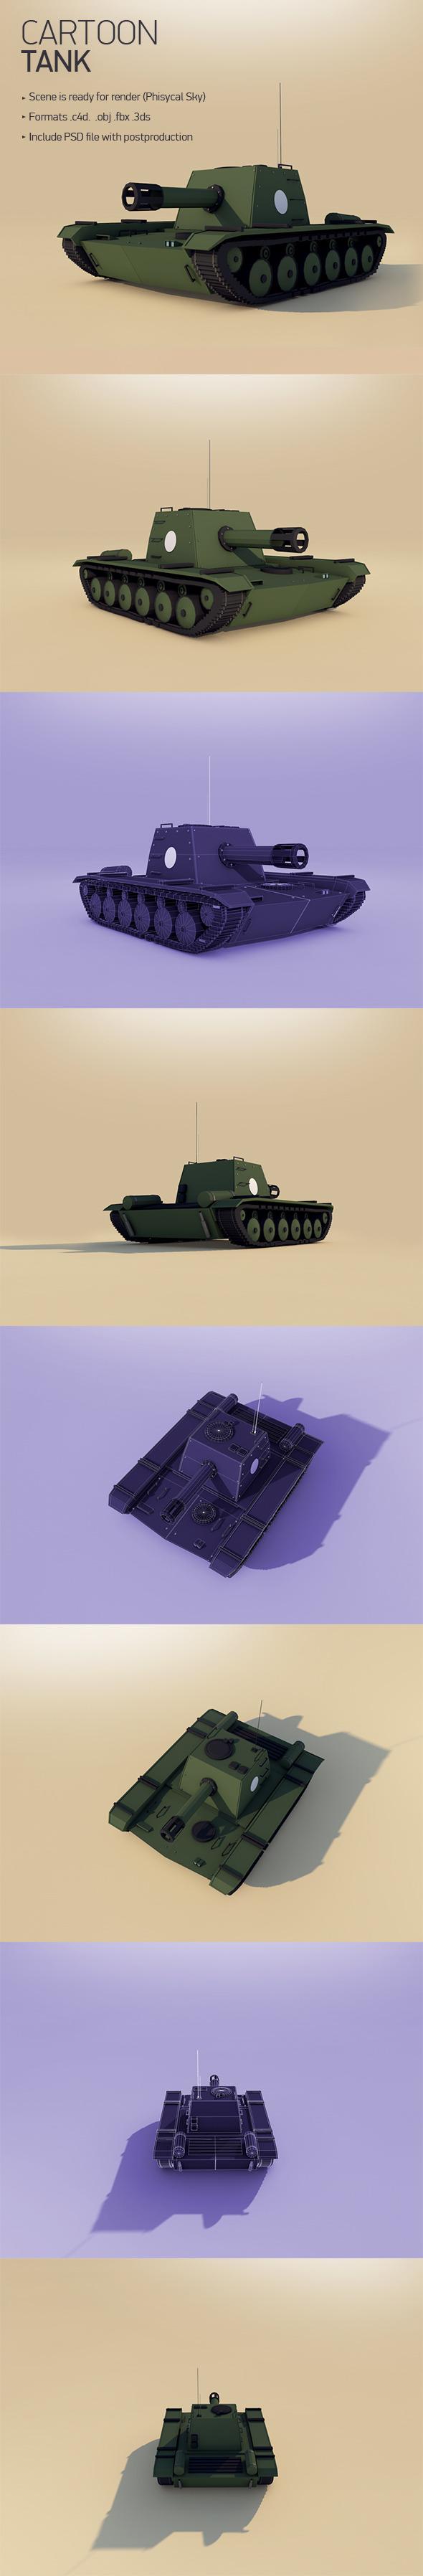 Cartoon Tank - 3DOcean Item for Sale